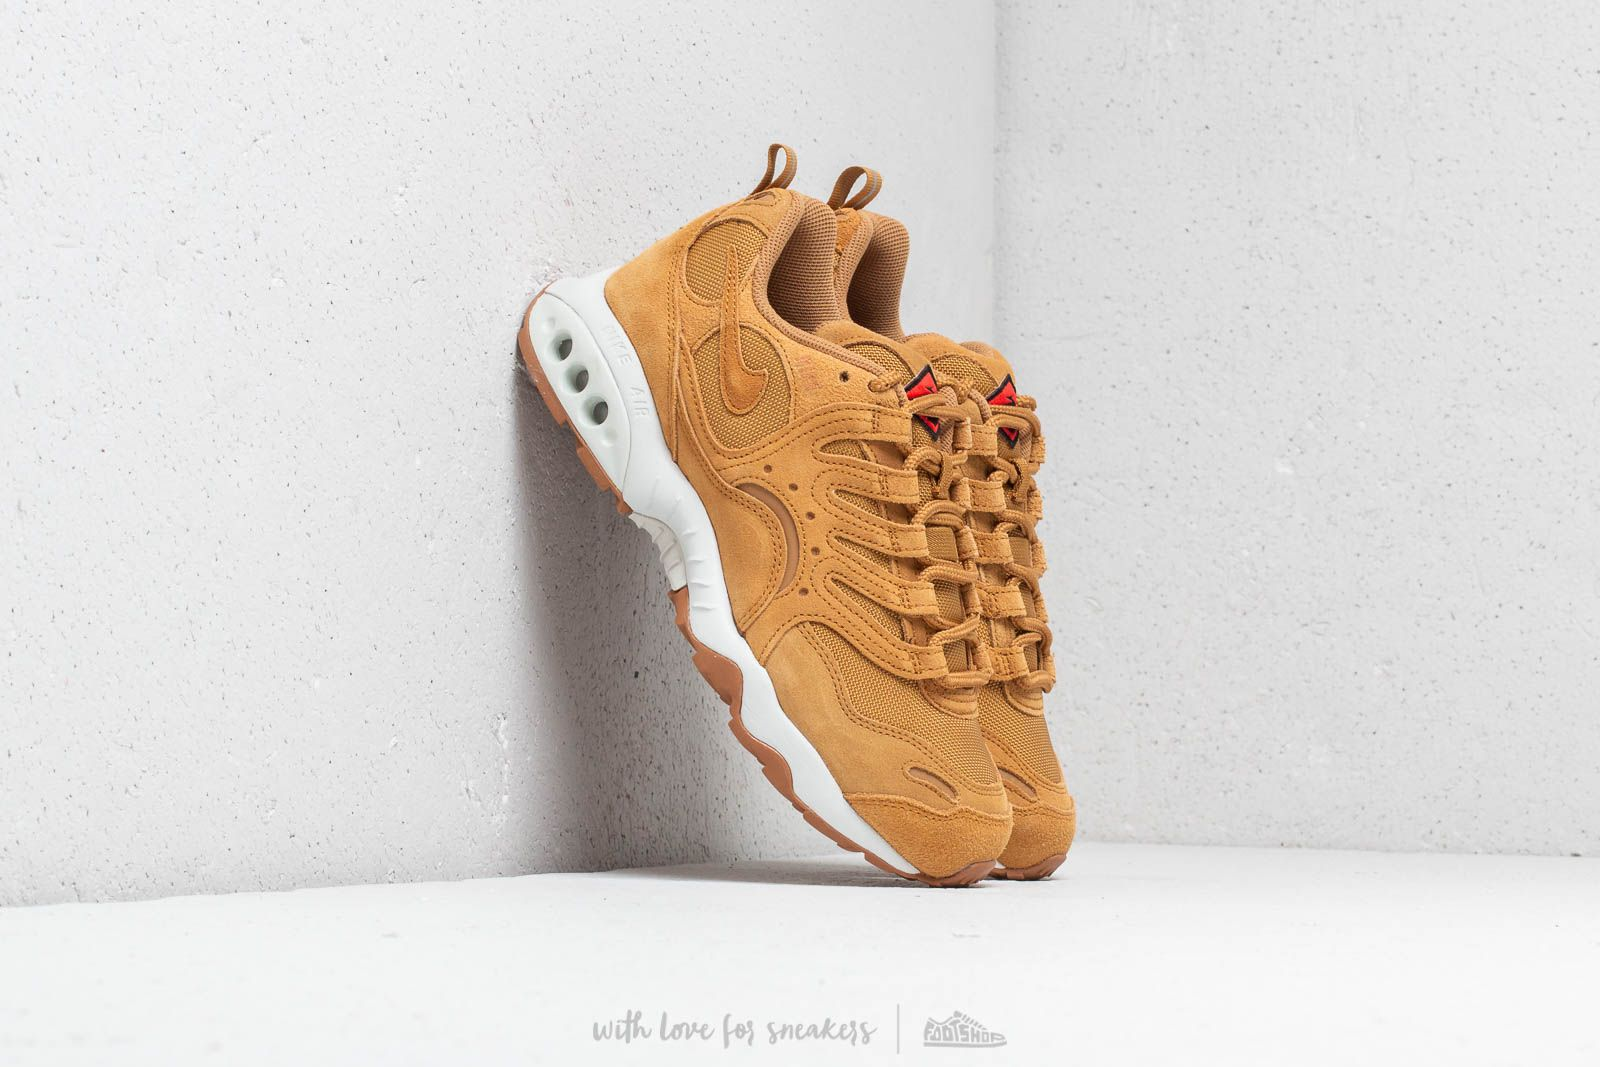 Nike Air Terra Humara ´18 Leather Wheat/ Wheat-Light Bone za skvělou cenu 2 720 Kč koupíte na Footshop.cz